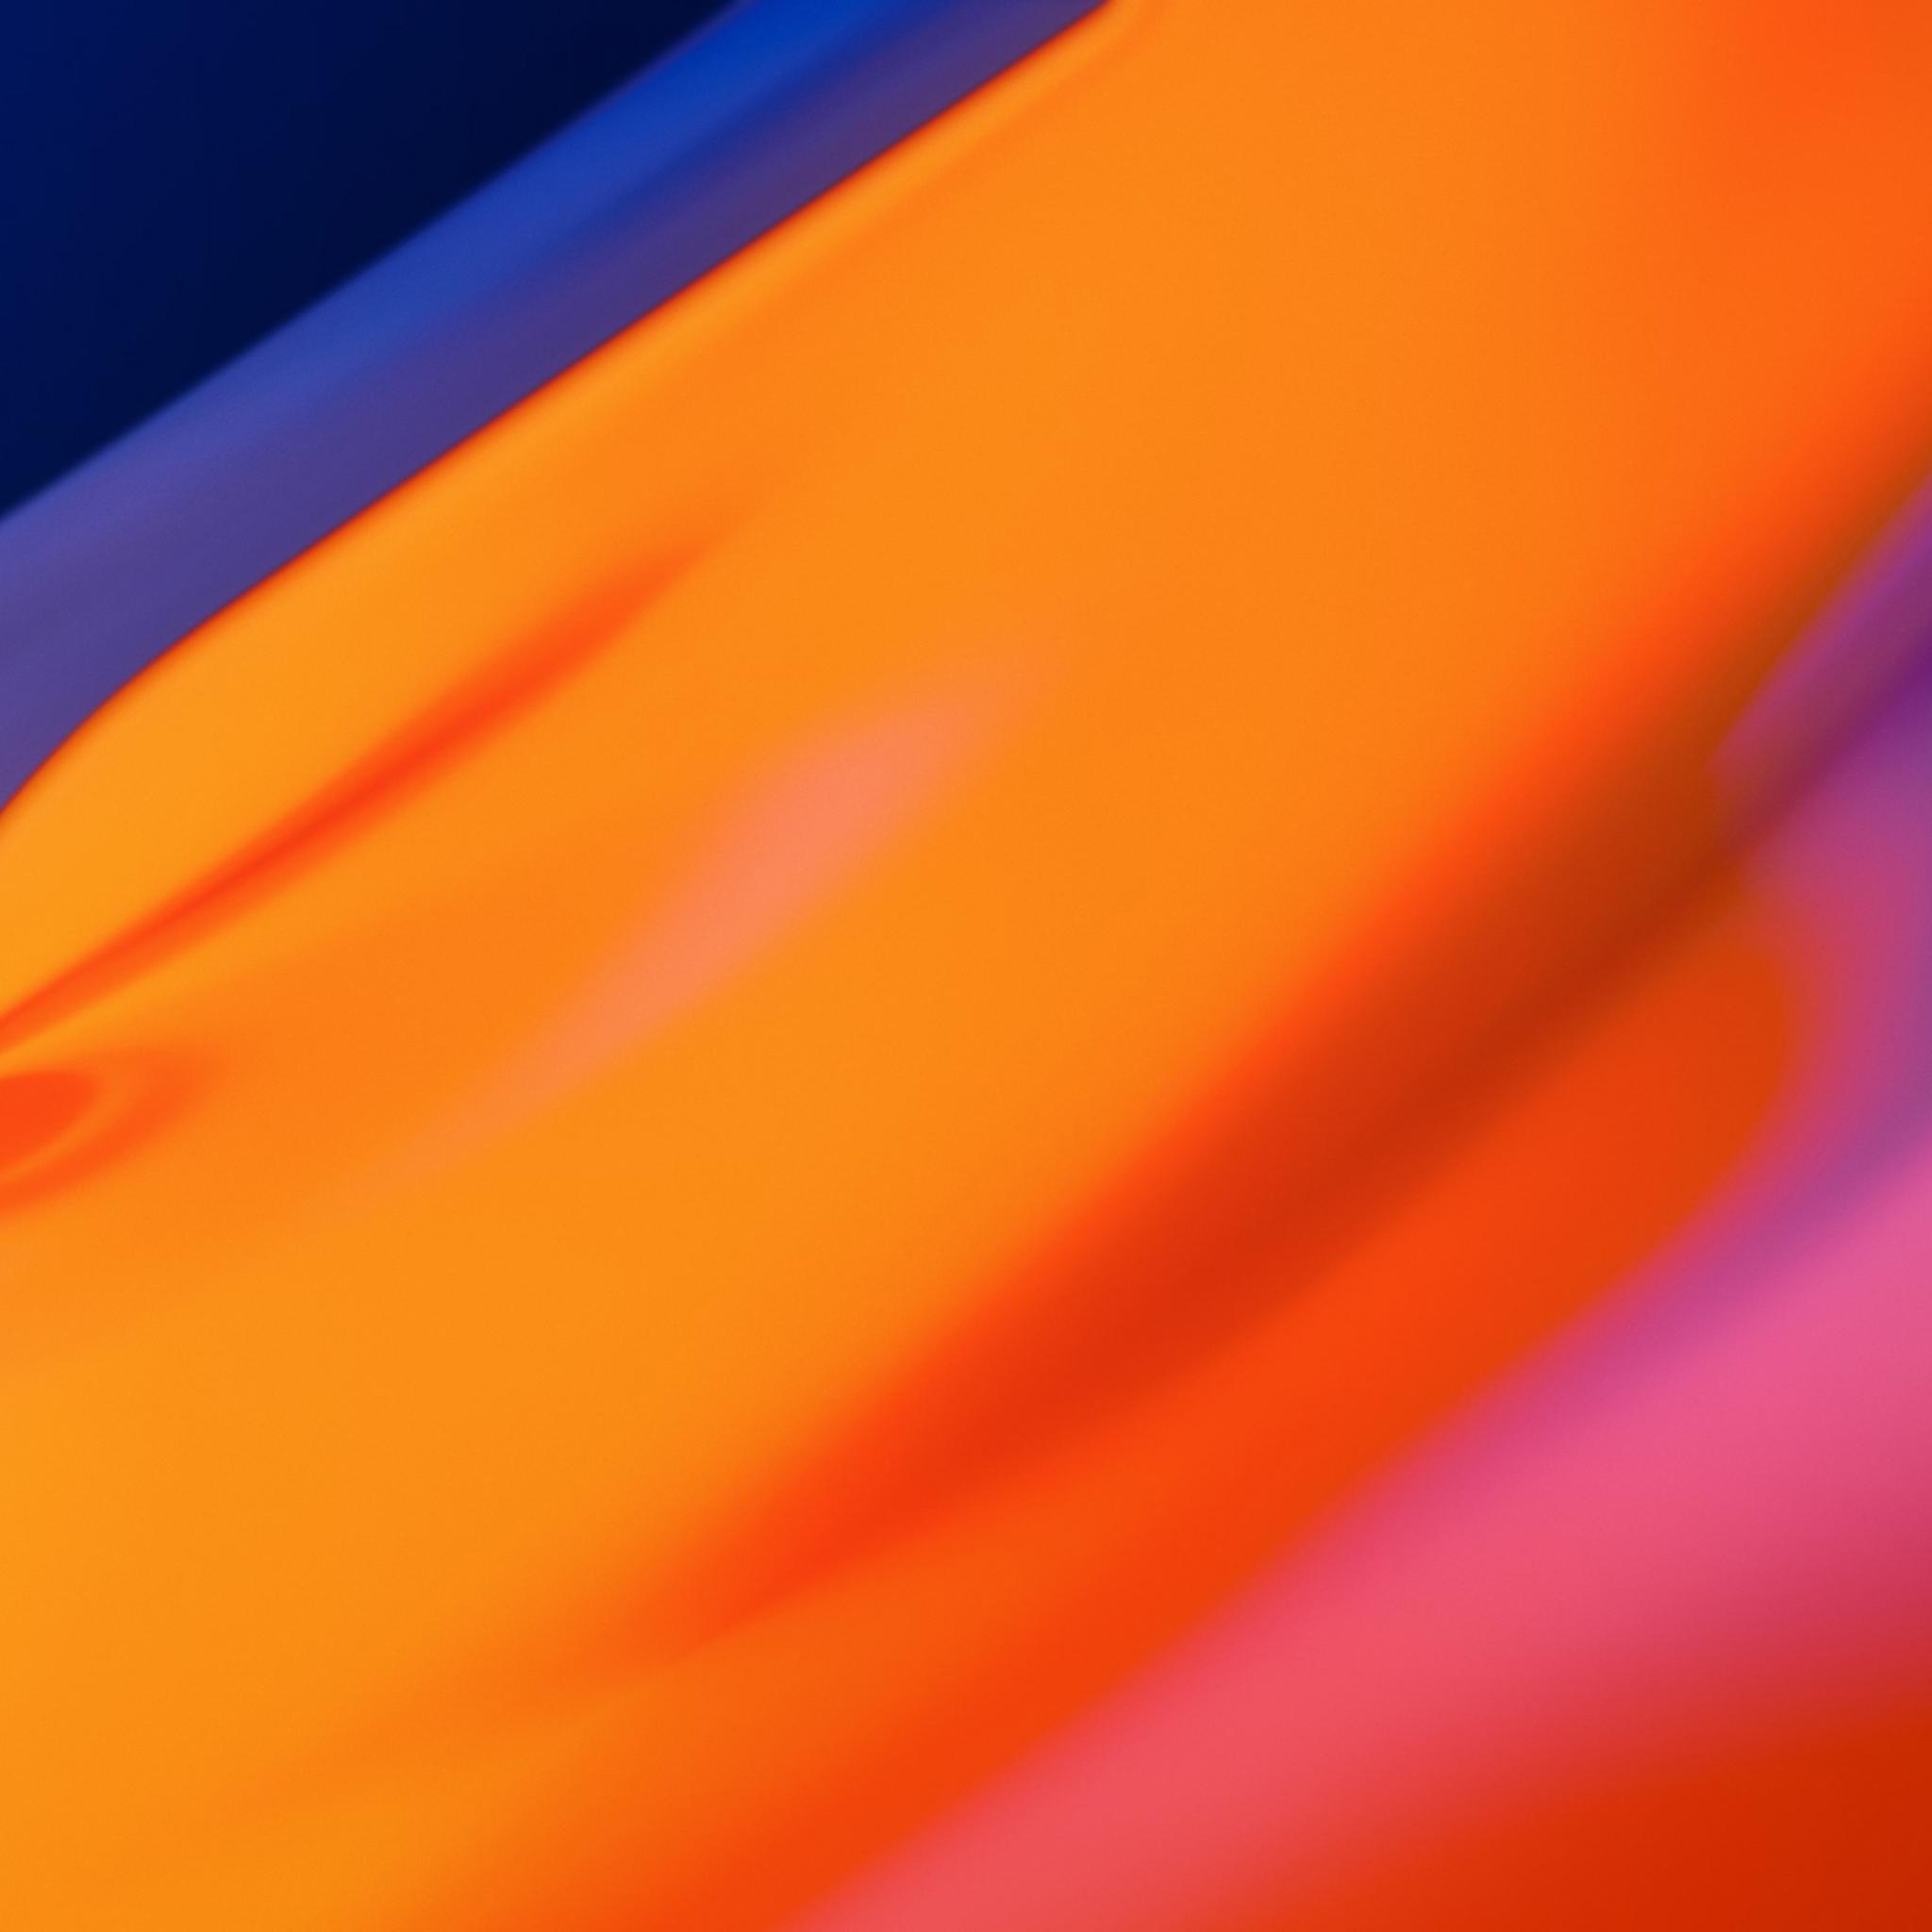 2048x2048 OnePlus TV Stock Ipad Air Wallpaper, HD Abstract